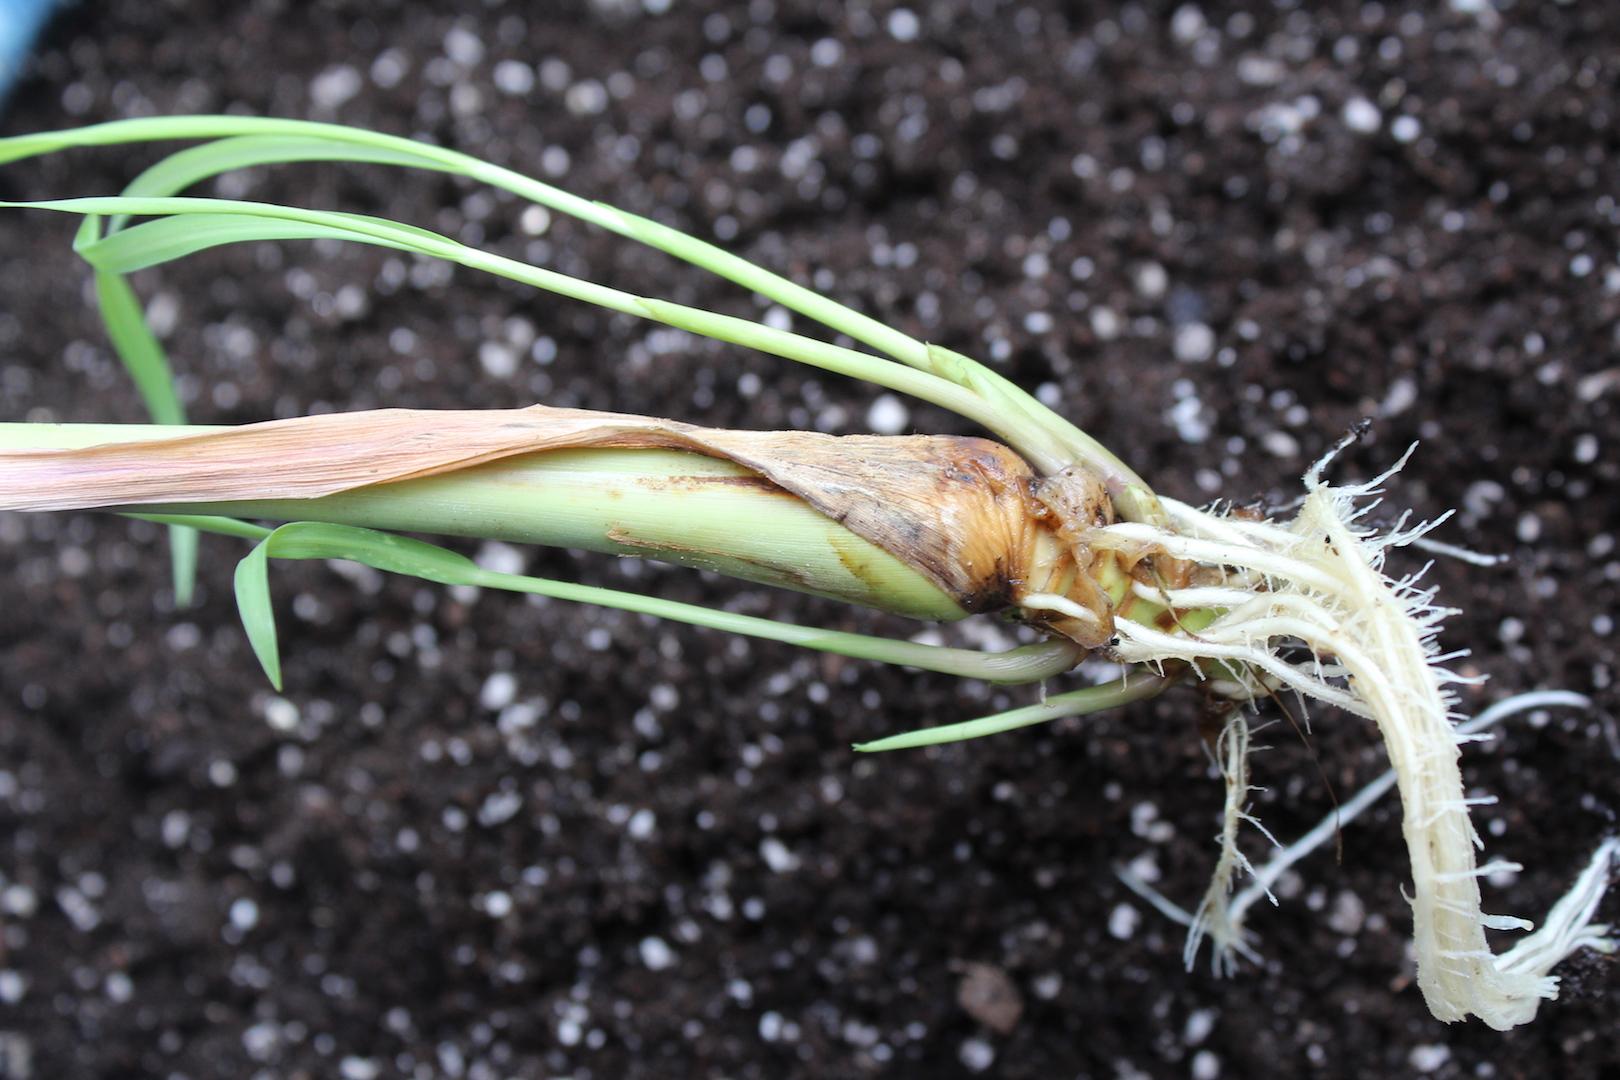 Growing Lemongrass from Cuttings